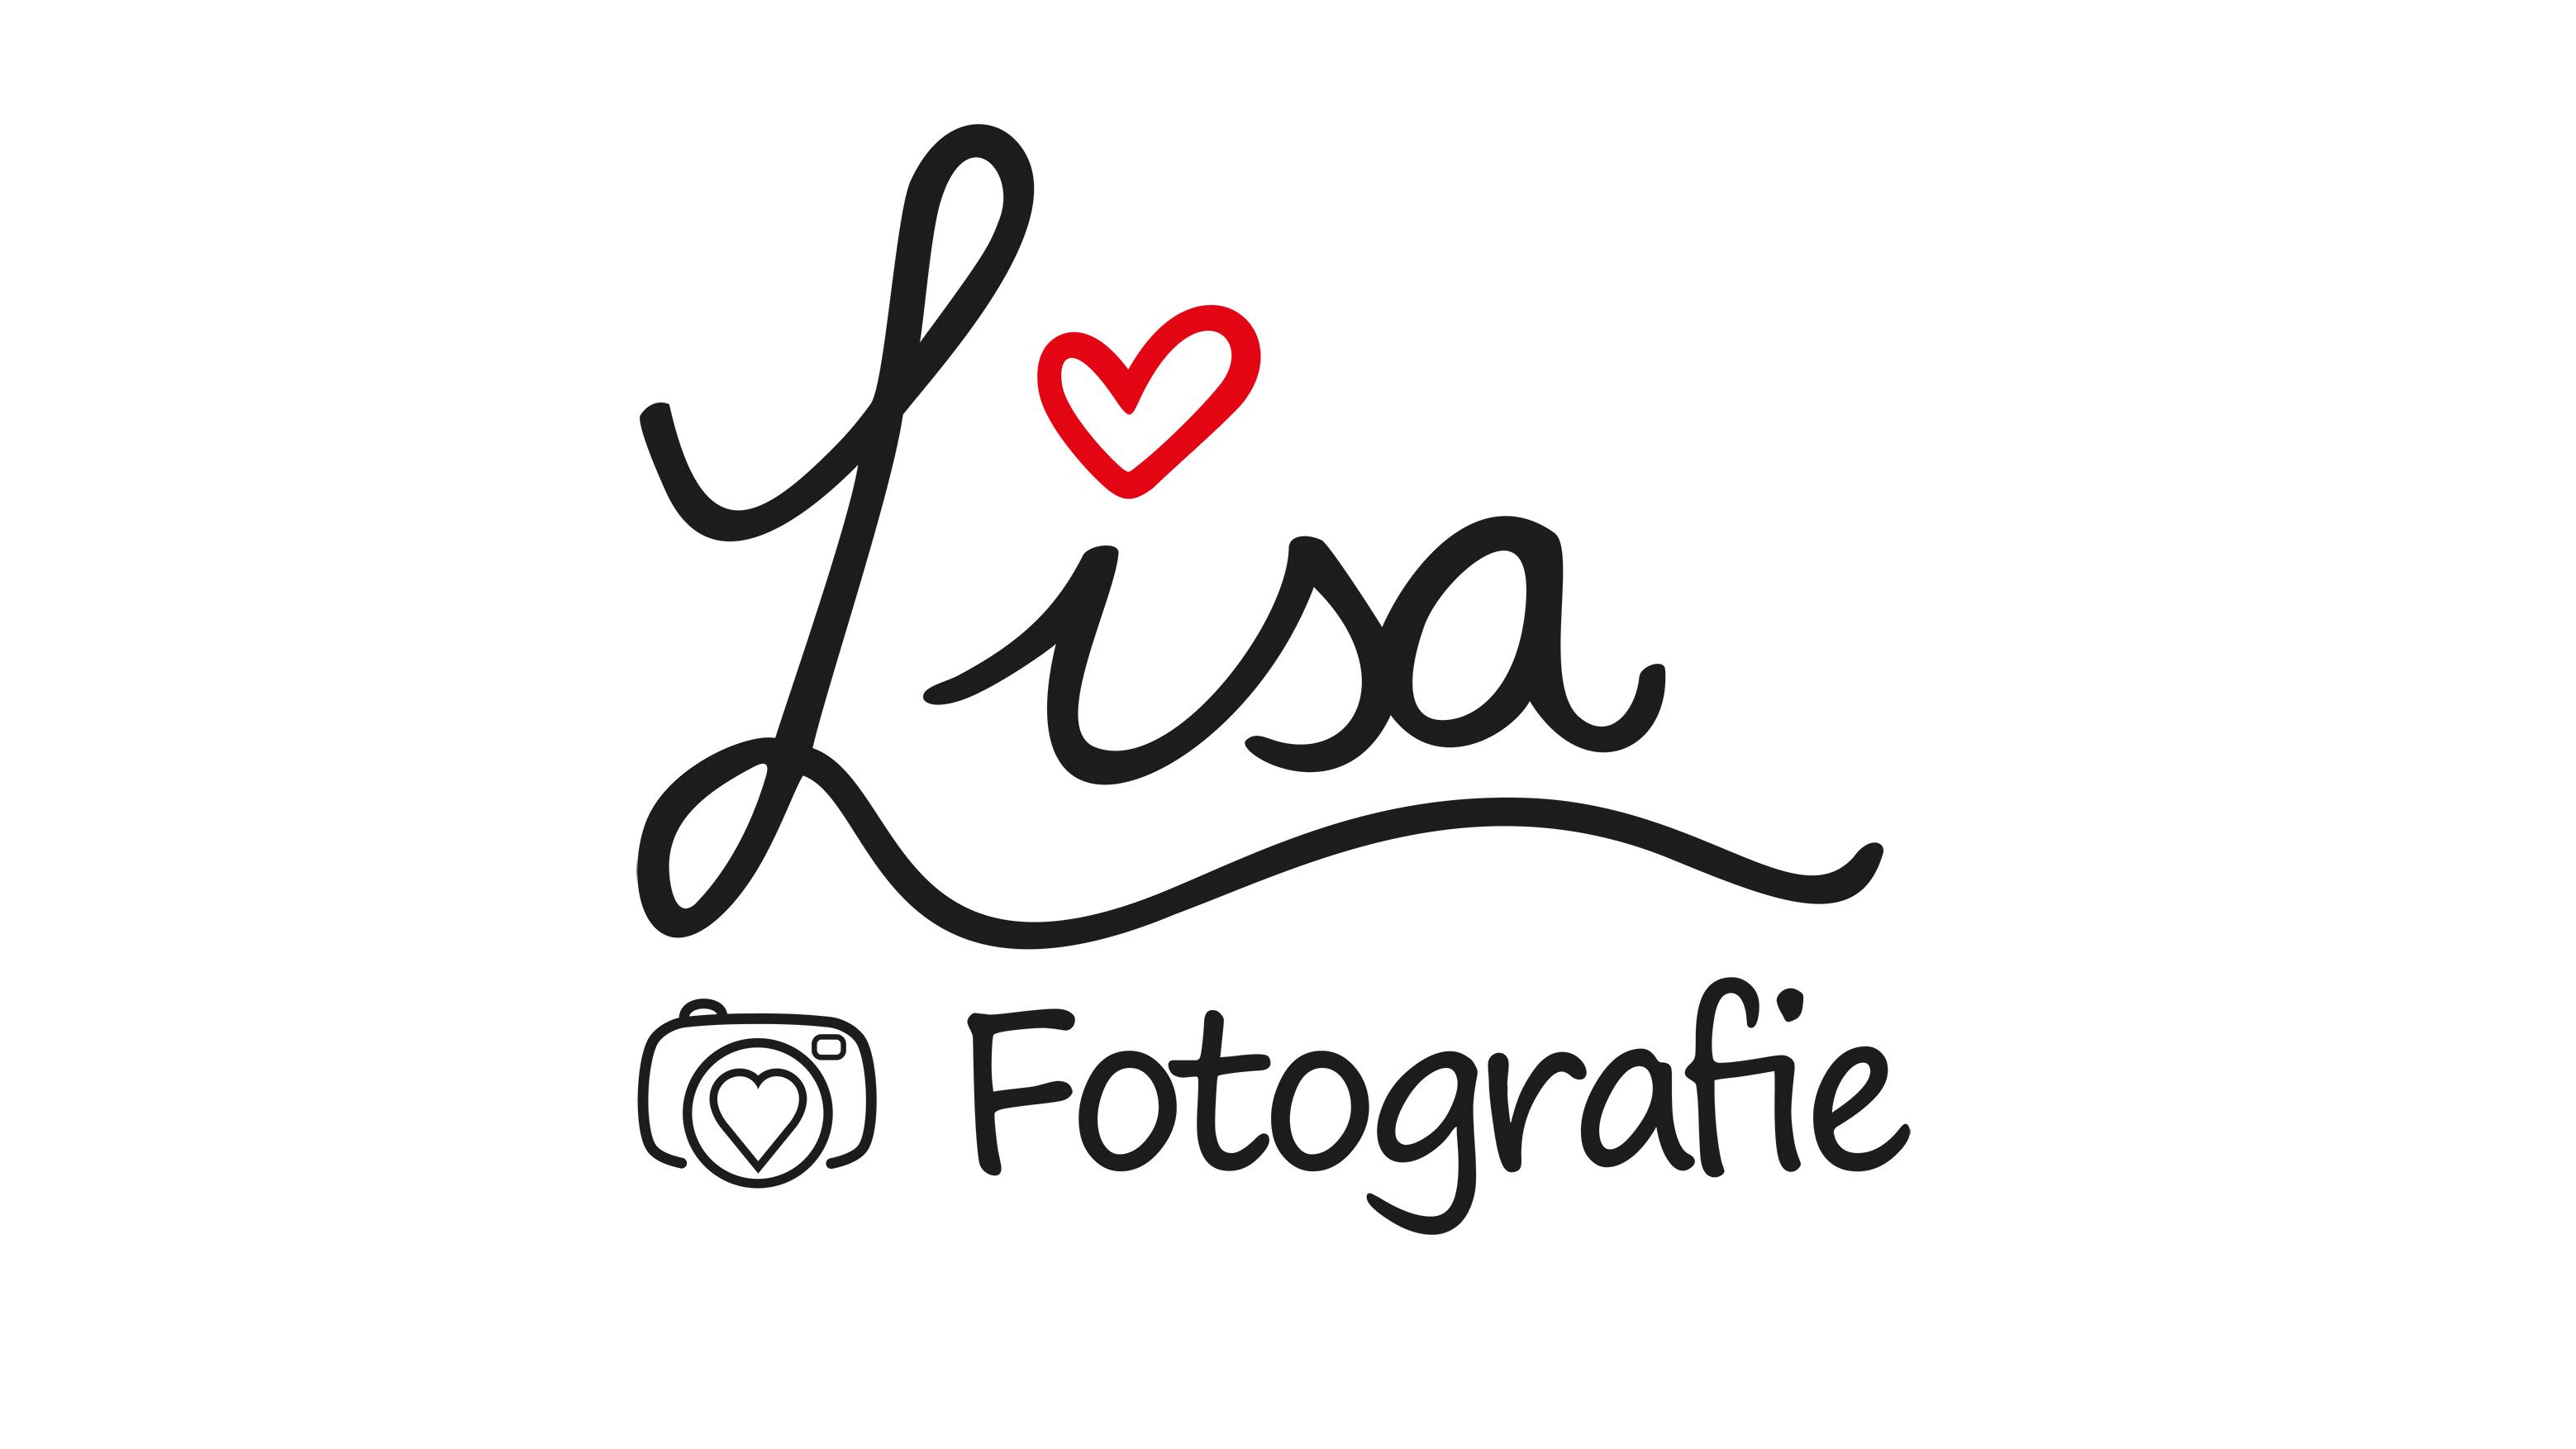 Lisa Fotografie